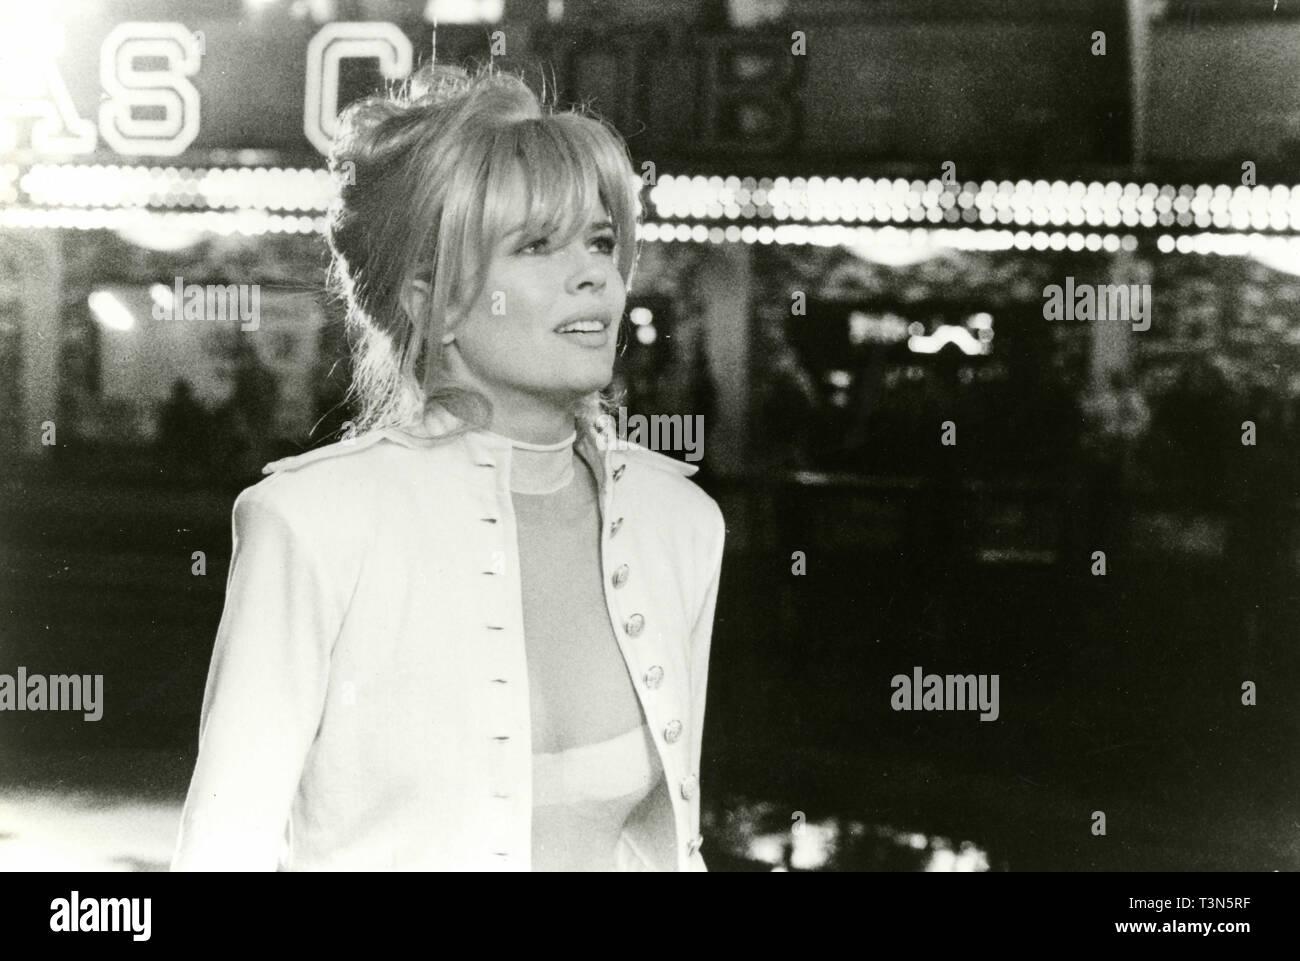 Kim Basinger In The Movie Cool World 1992 Stock Photo Alamy